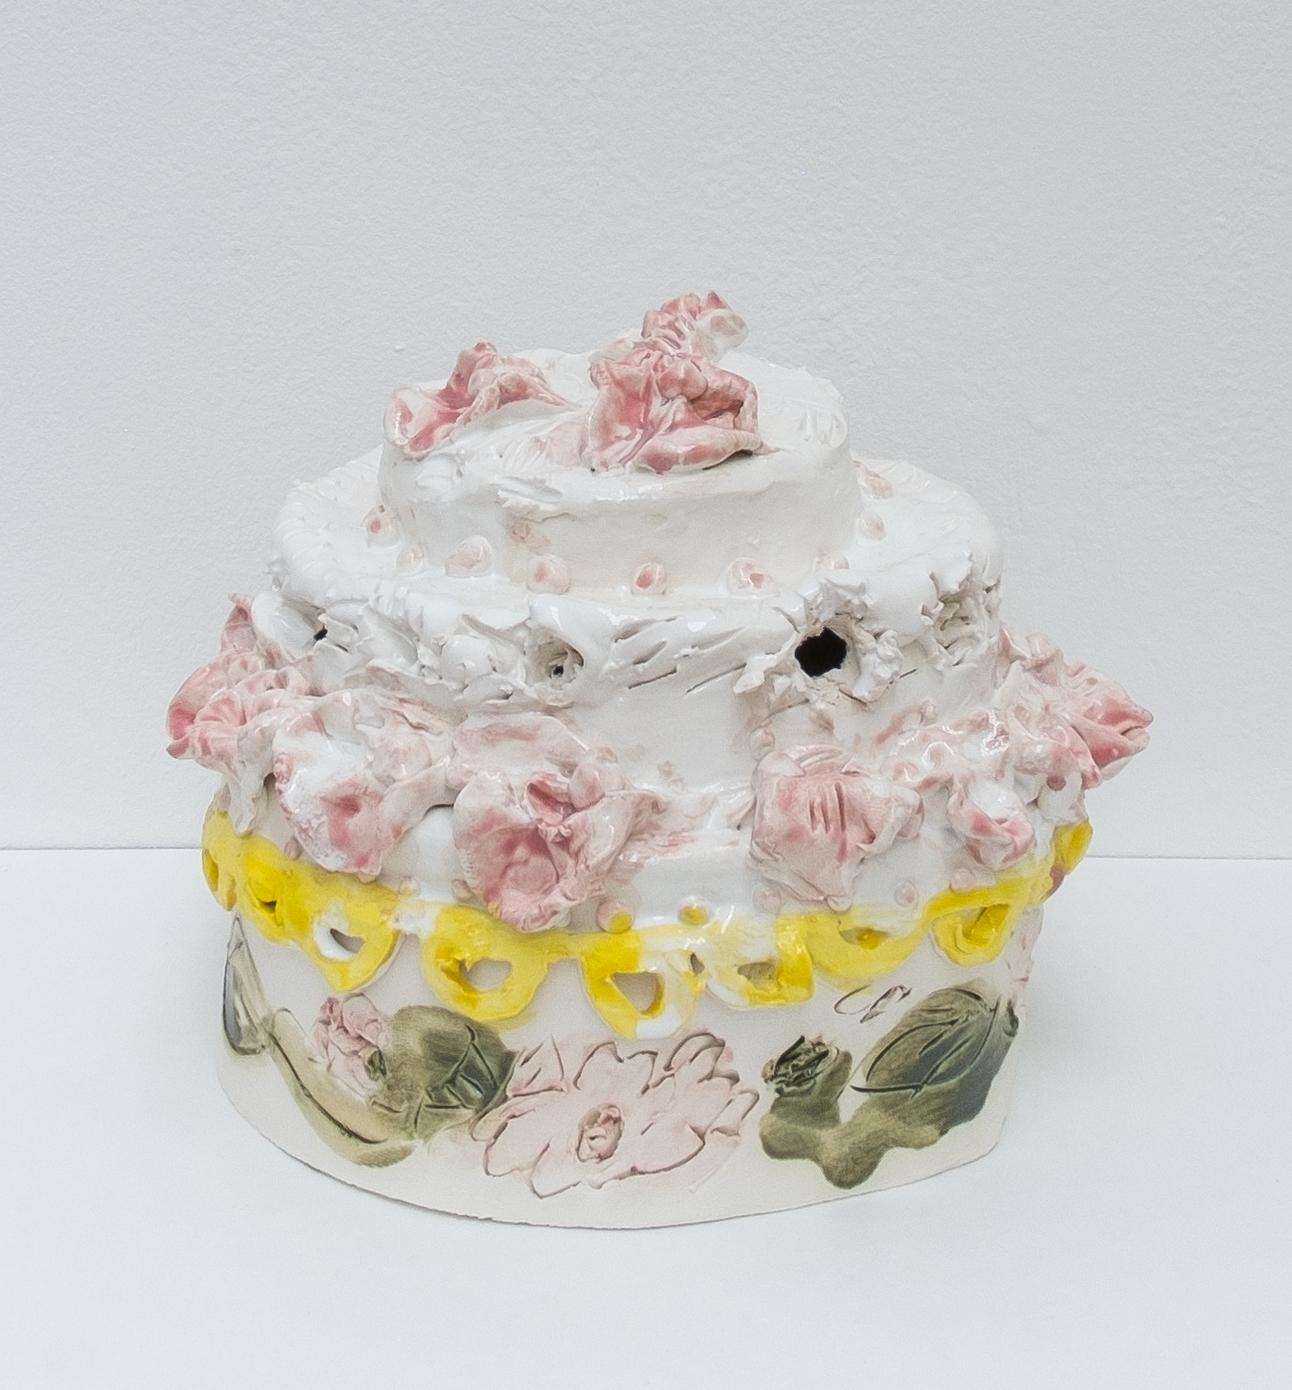 Light Diet Cake  Glazed Ceramics   25 x 24 x 24 cm